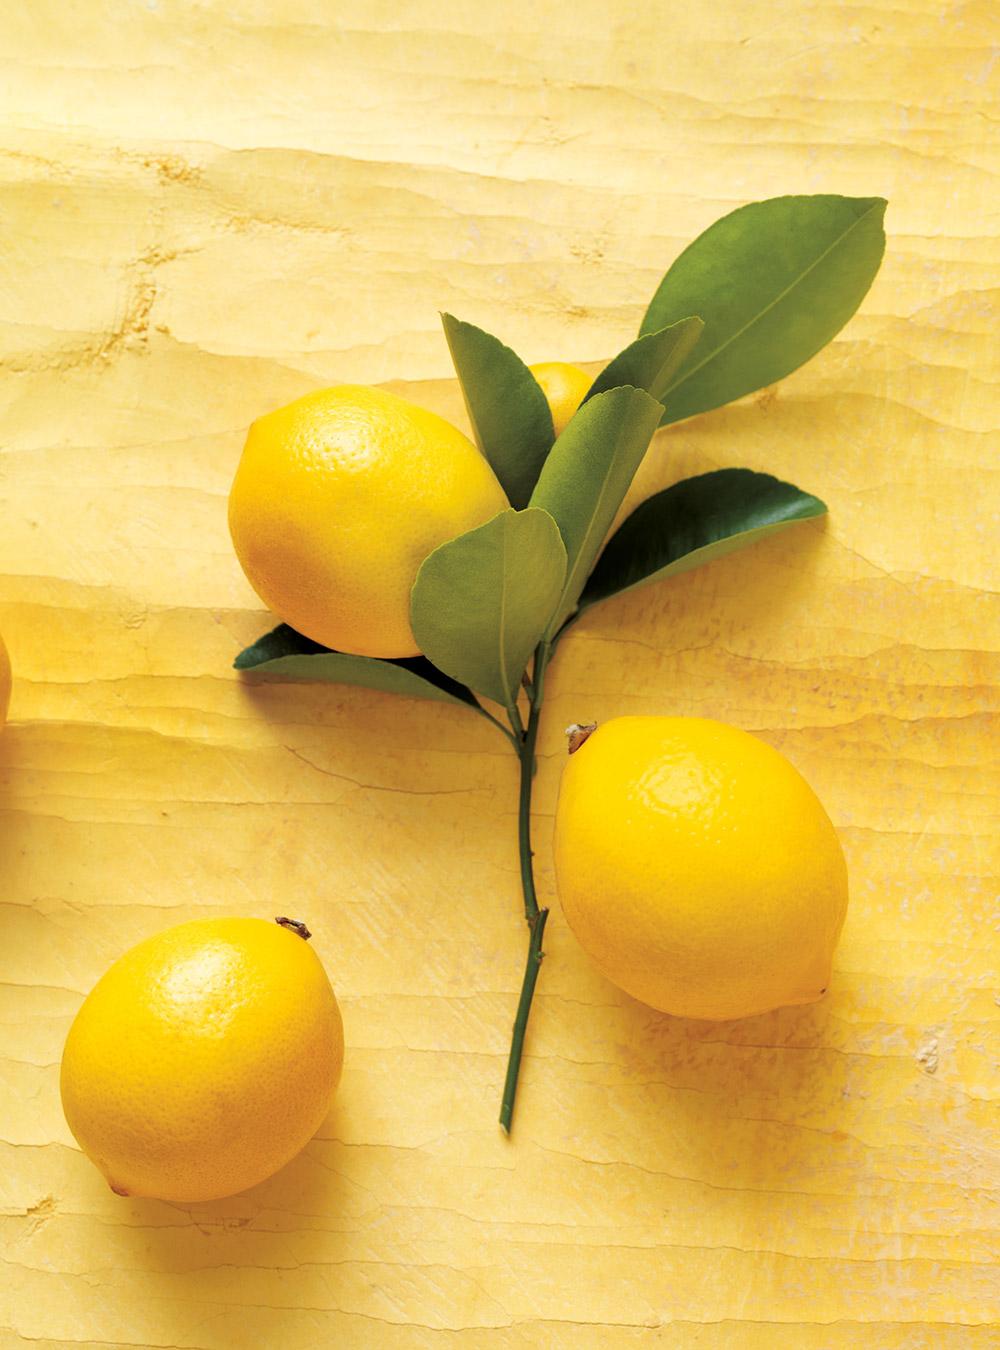 Sirops de fruits parfumés | ricardo